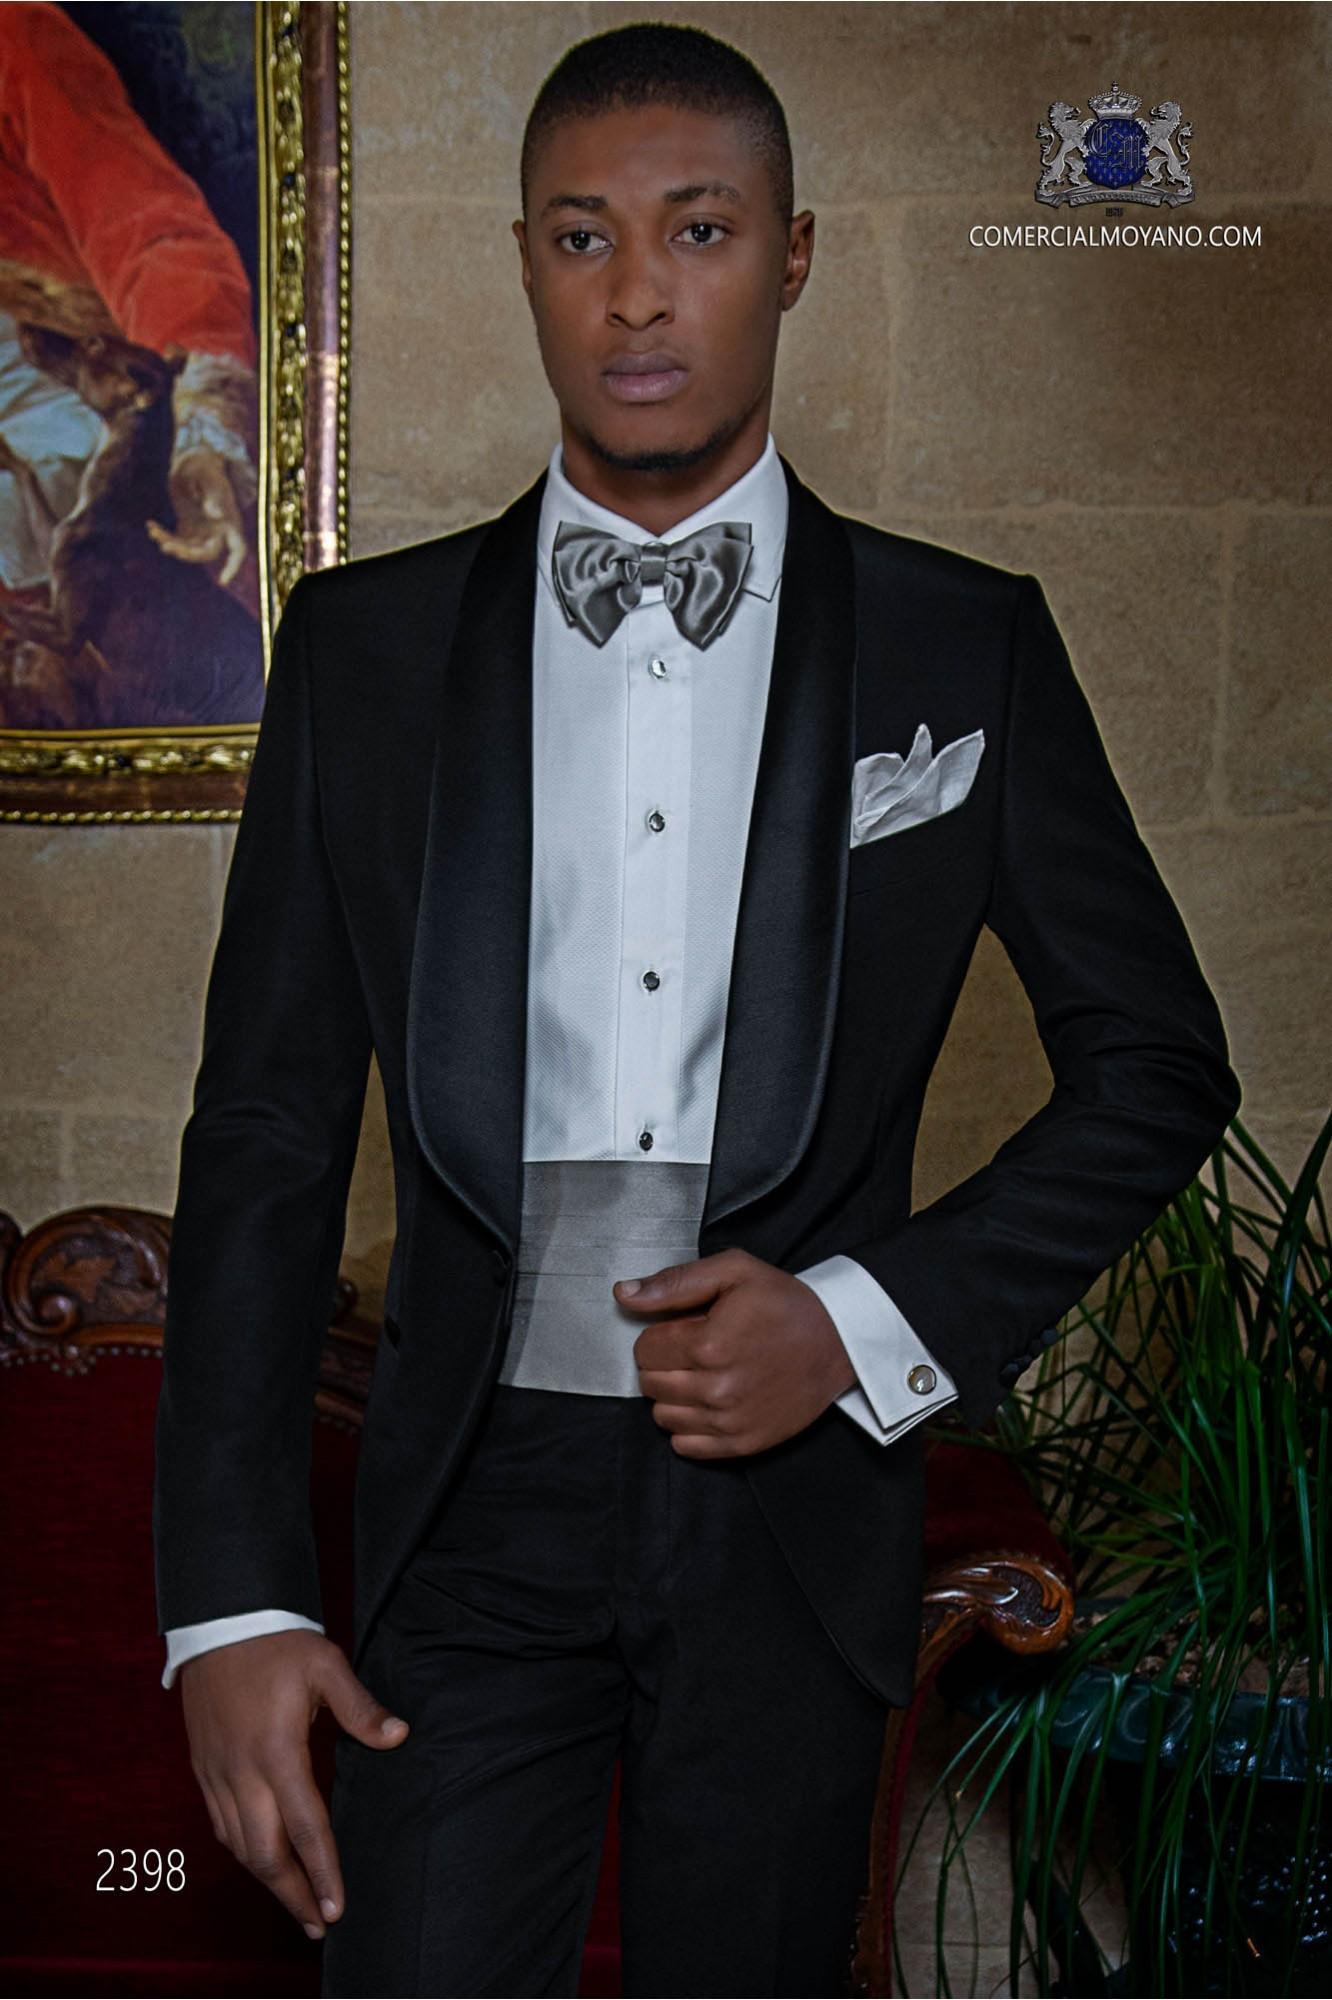 Italian bespoke black breasted tuxedo model 2398 Ottavio Nuccio Gala